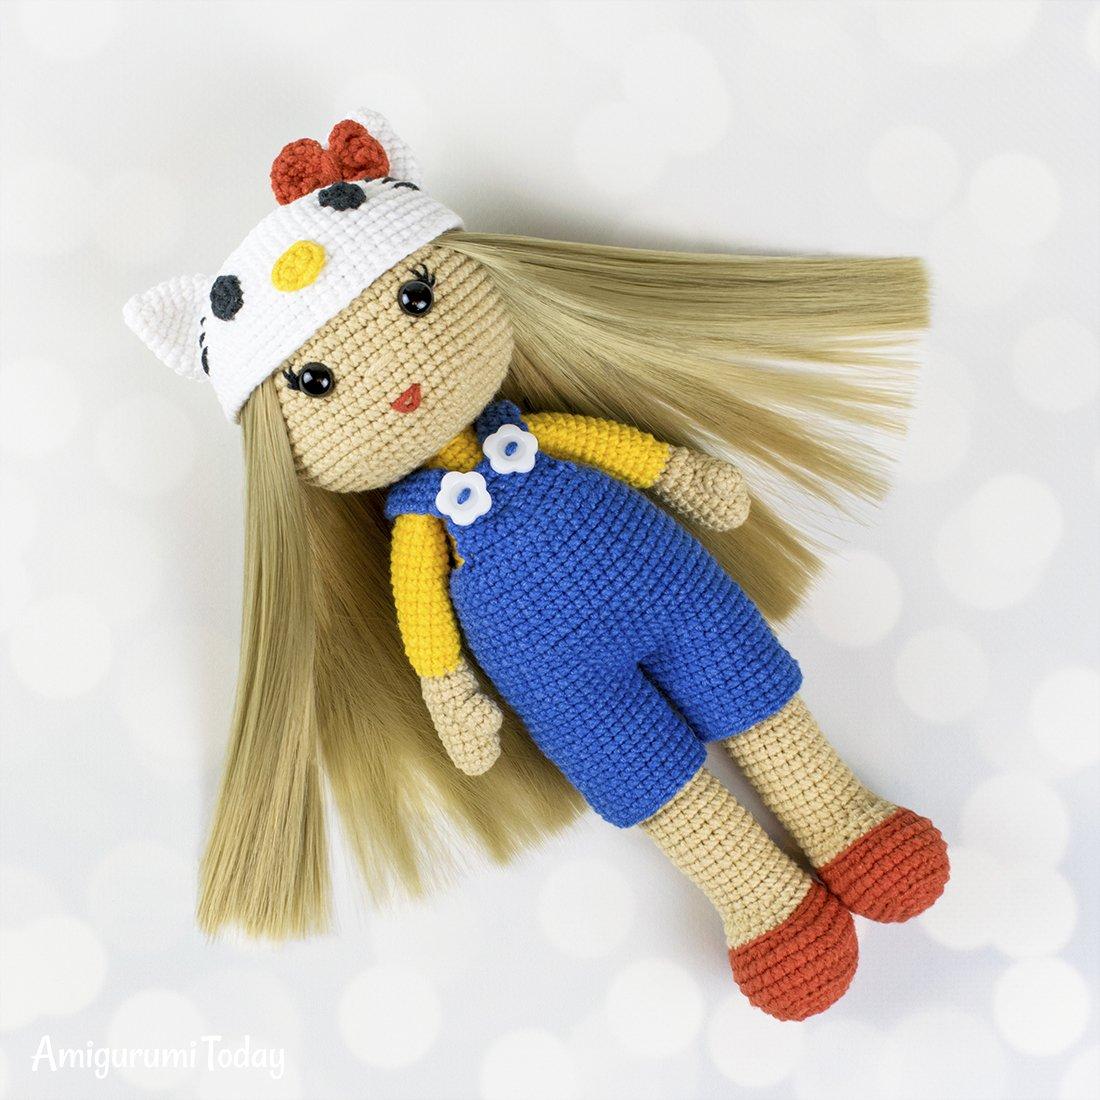 Amigurumi rabbit baby rattle - Amigurumi Today - Amigurumi Crochet ... | 1100x1100